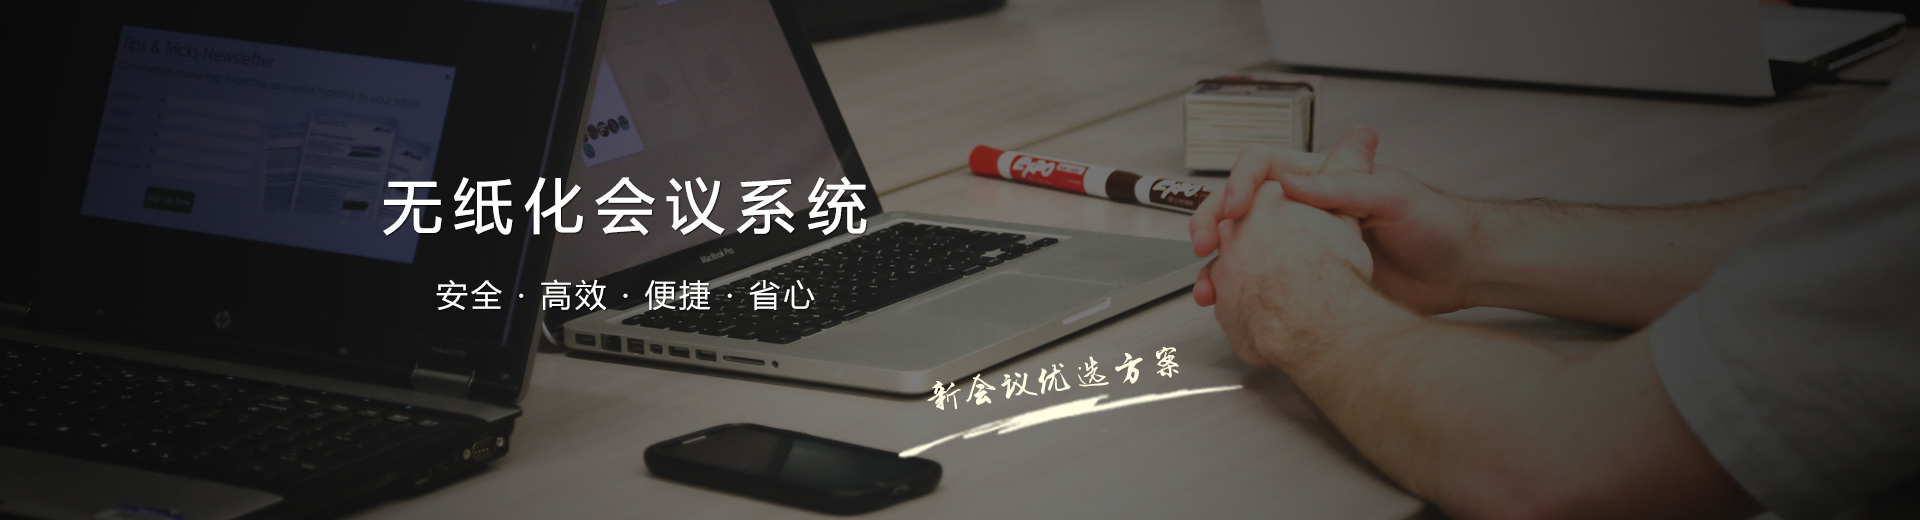 reeko锐科上云服务无纸化会议系统方案,云服务器方案解决商